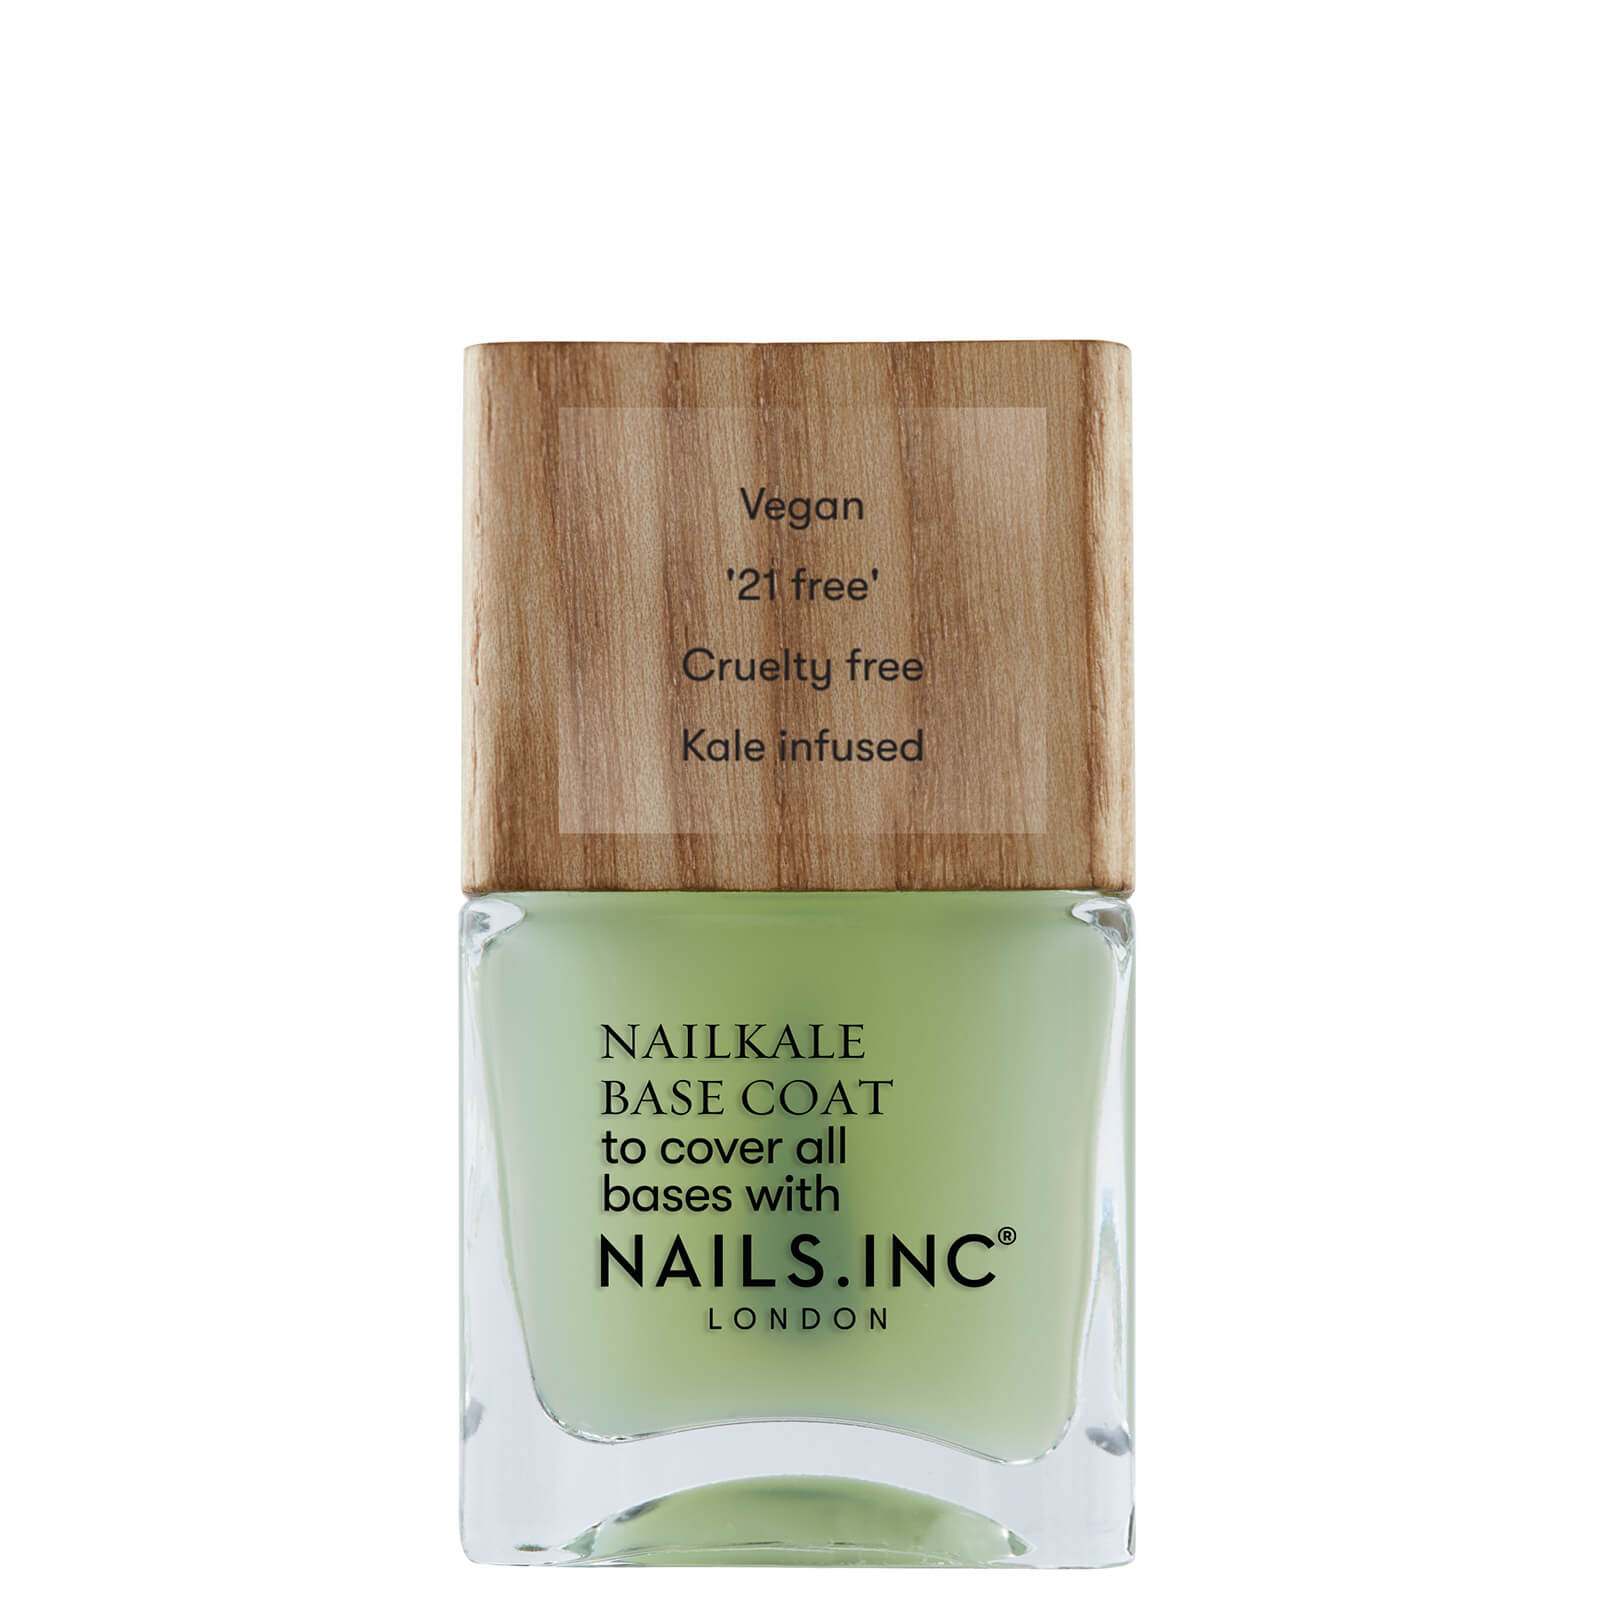 Купить Nails.INC Nail Kale Superfood Base Coat 14ml